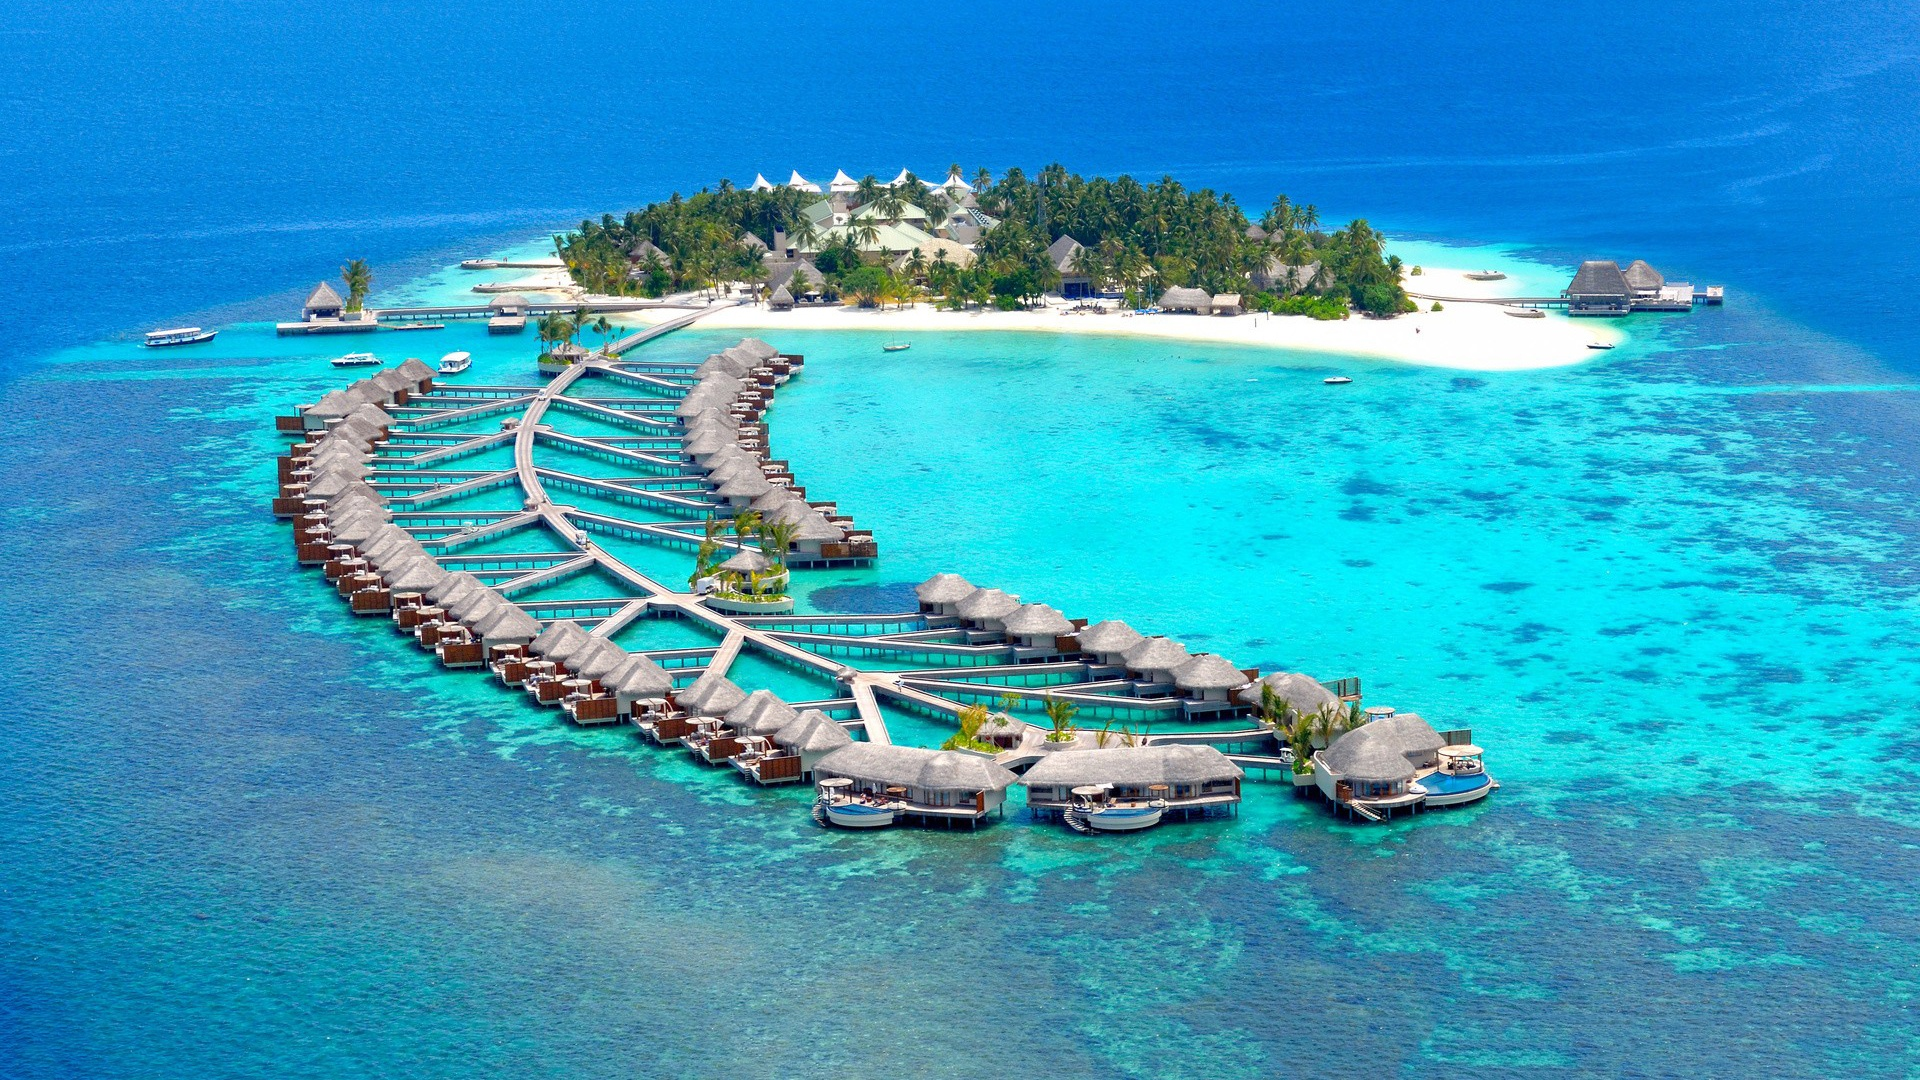 Beautiful Maldives Island Wallpaper Background #6046 Wallpaper | High ...